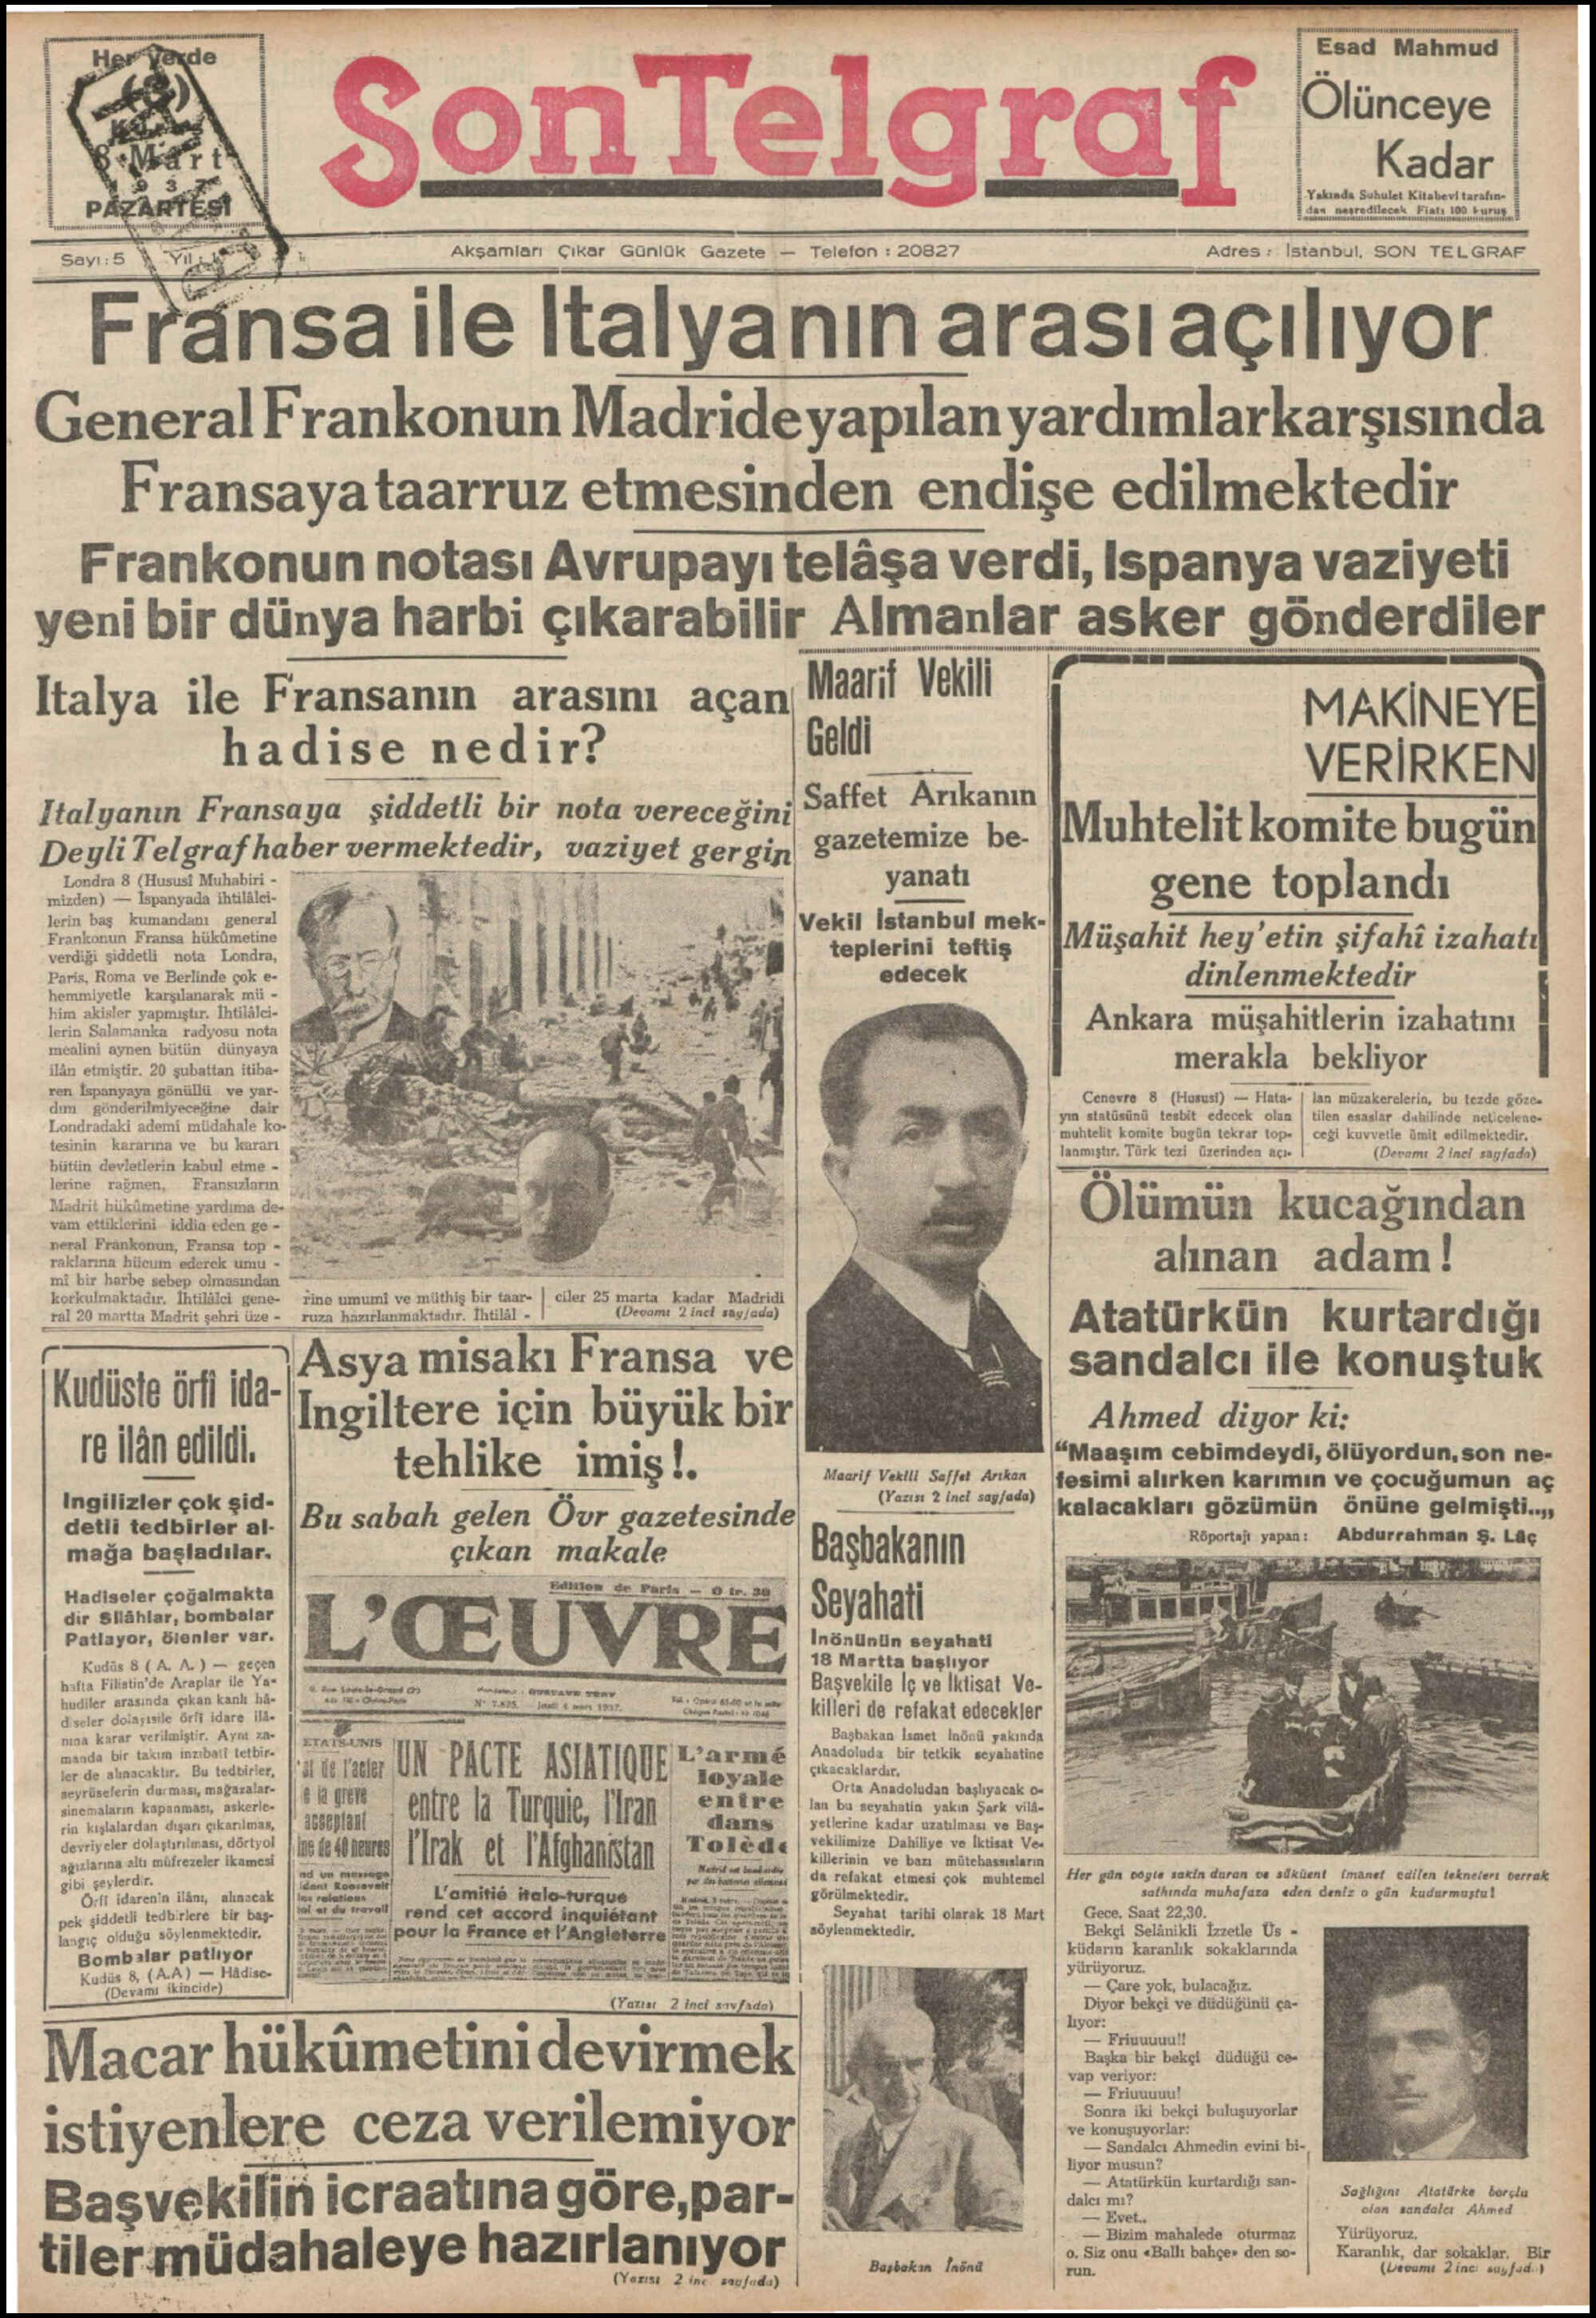 8 Mart 1937 Tarihli Son Telgraf Gazetesi Sayfa 1